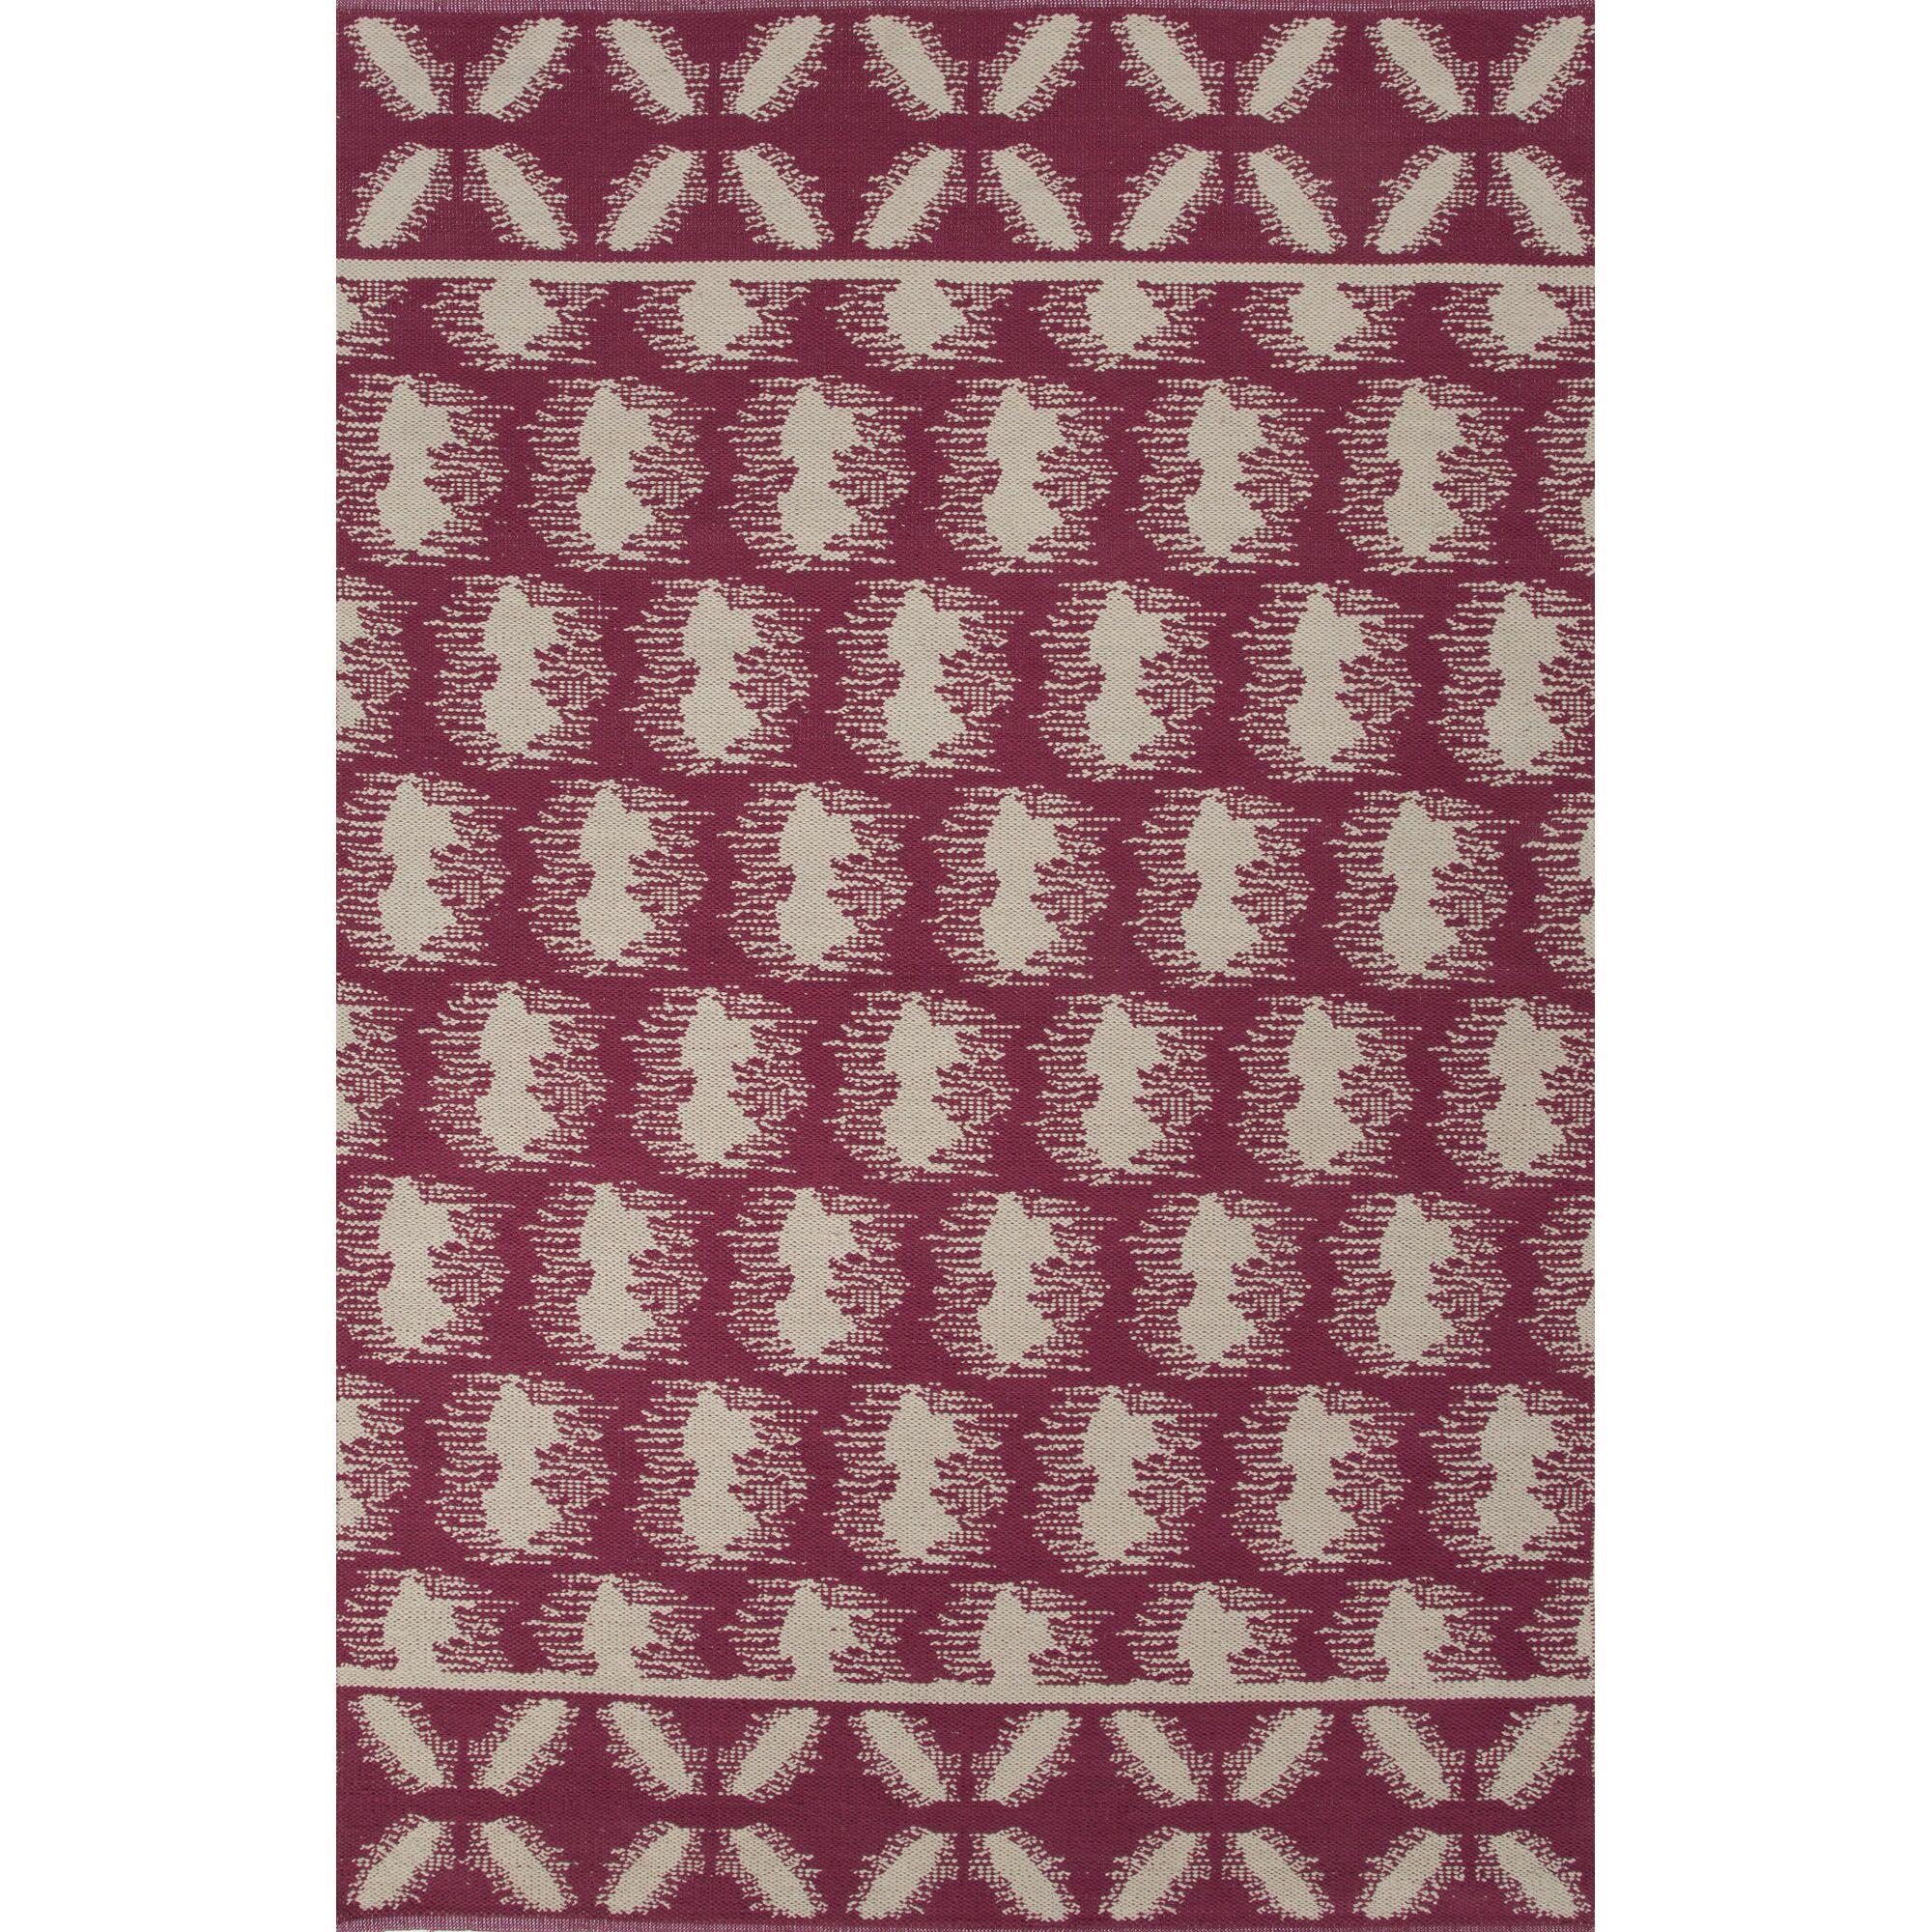 Camarillo Cotton Flat Weave Cotton Cordovan/Ivory Area Rug Rug Size: 5' x 8'